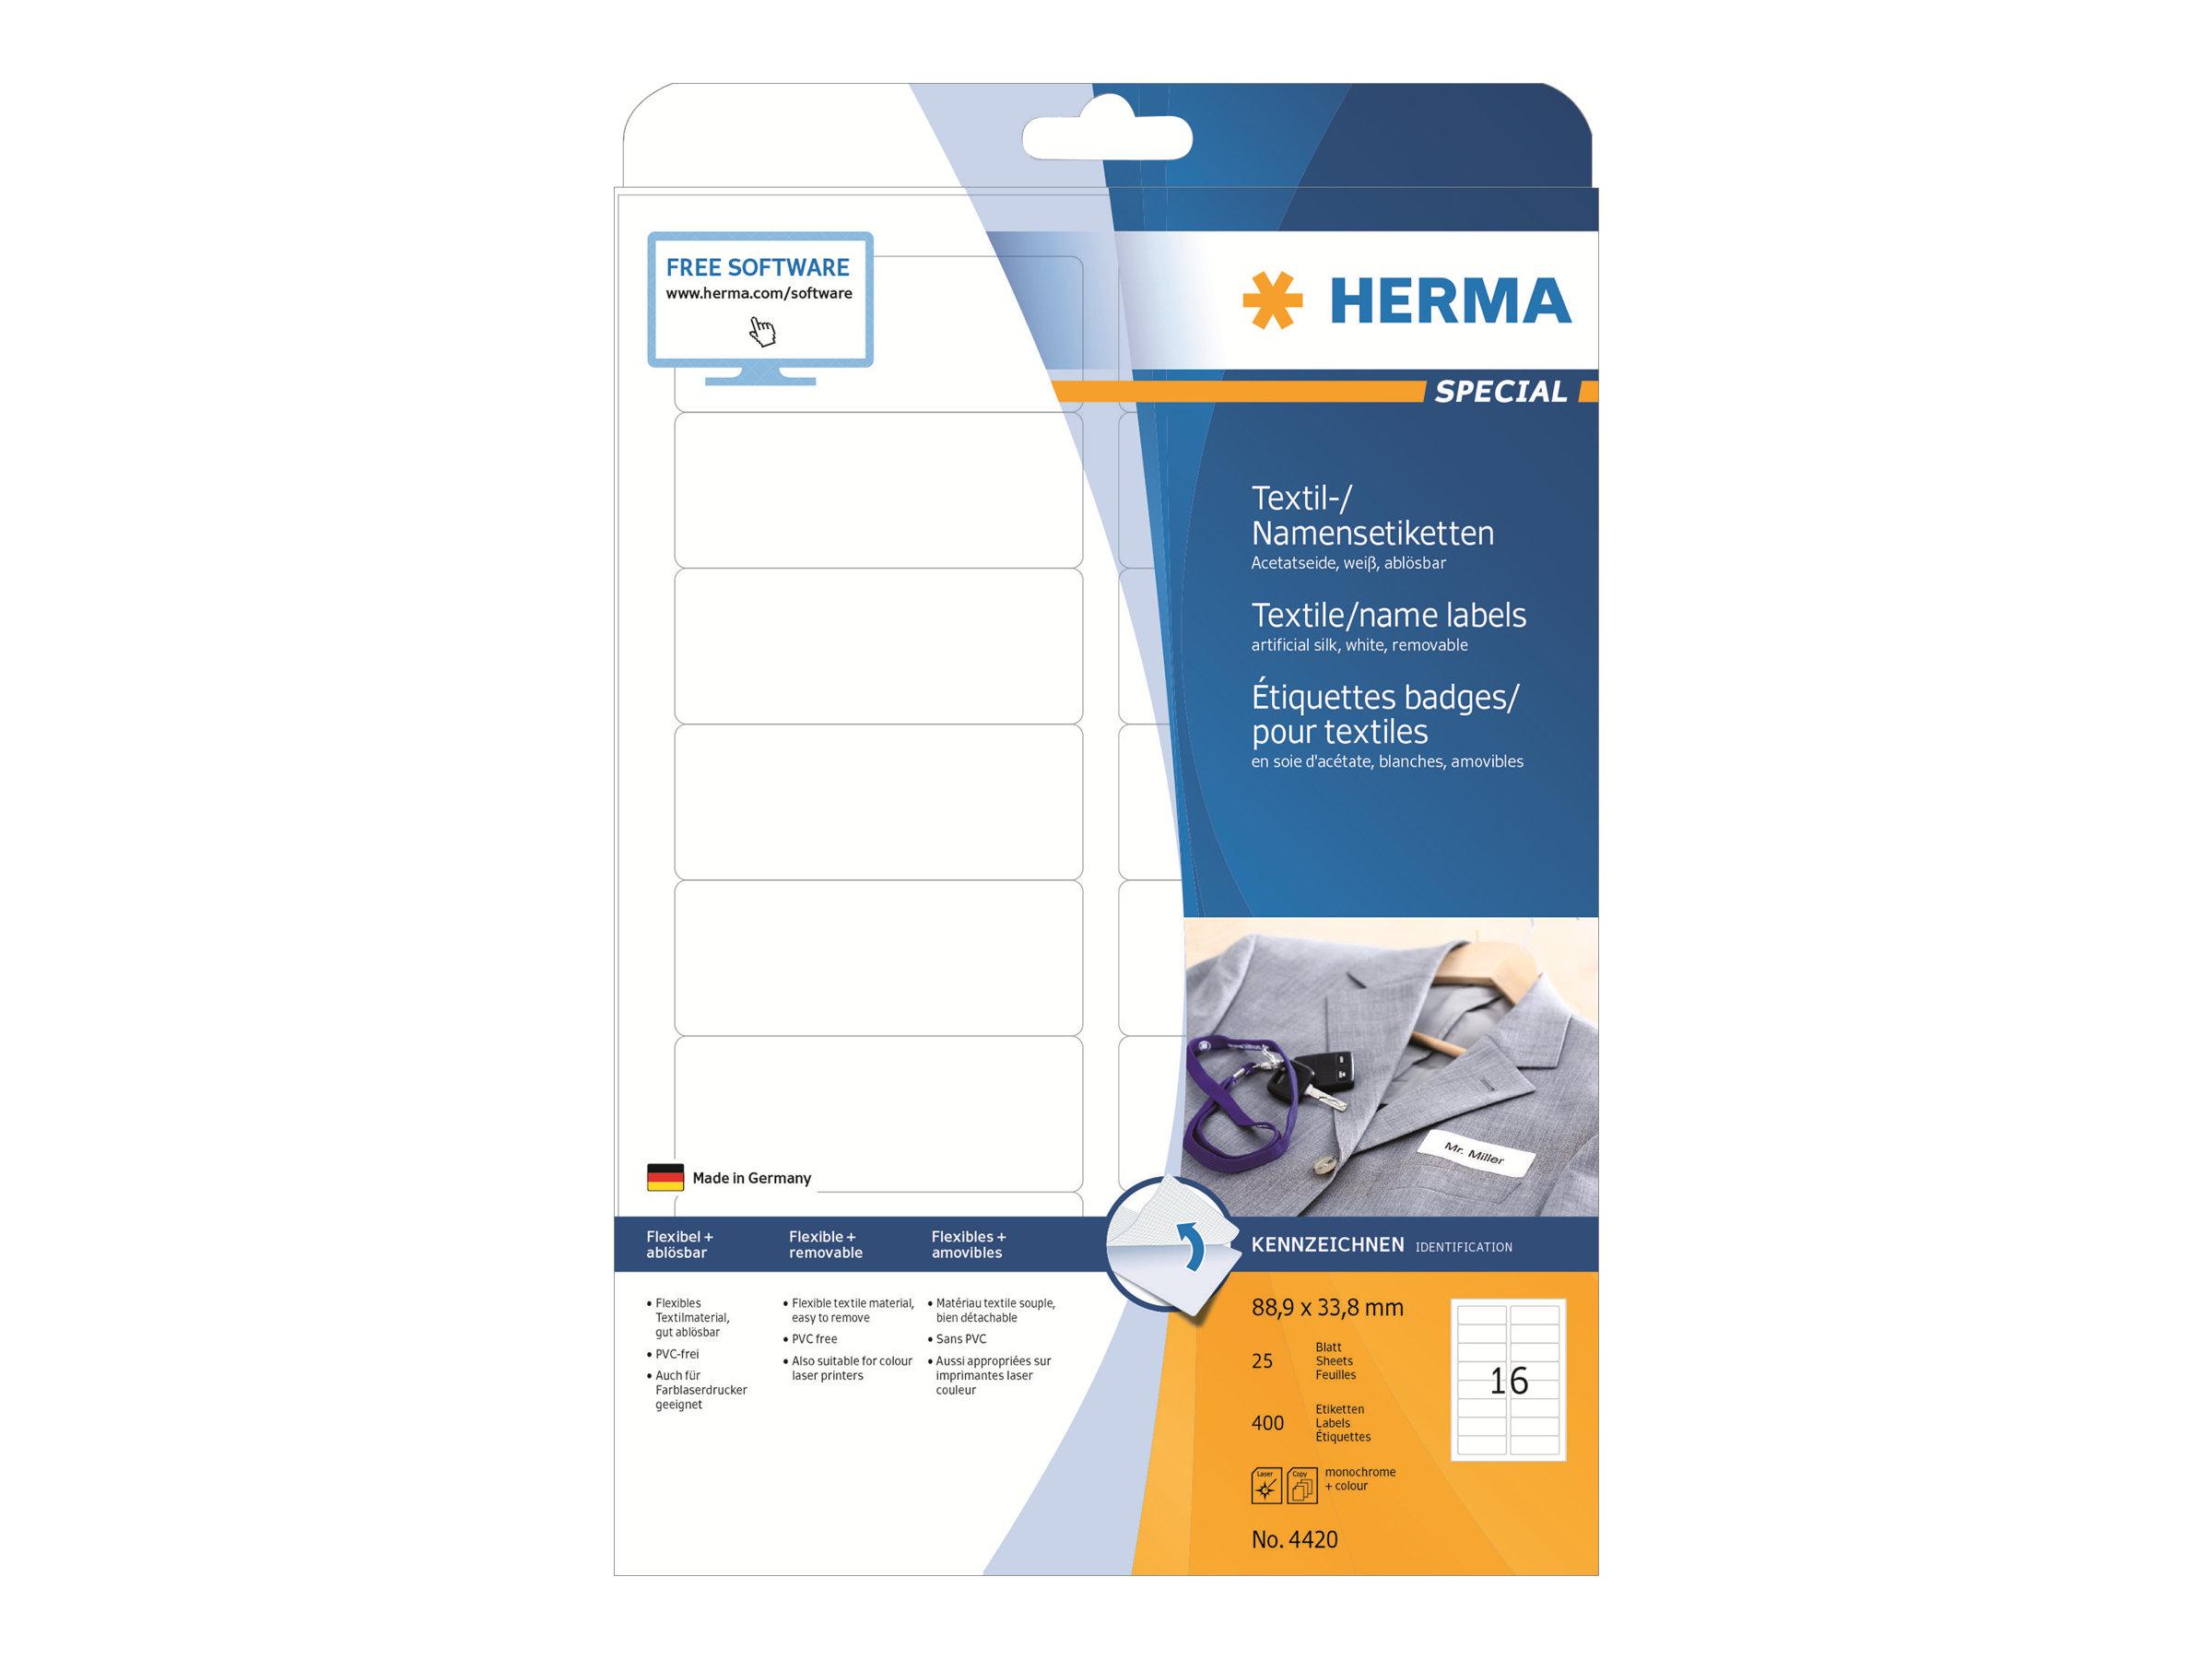 HERMA Special - Seidig - selbstklebend, entfernbarer Klebstoff - weiß - 88.9 x 33.8 mm 400 Etikett(en) (25 Bogen x 16)